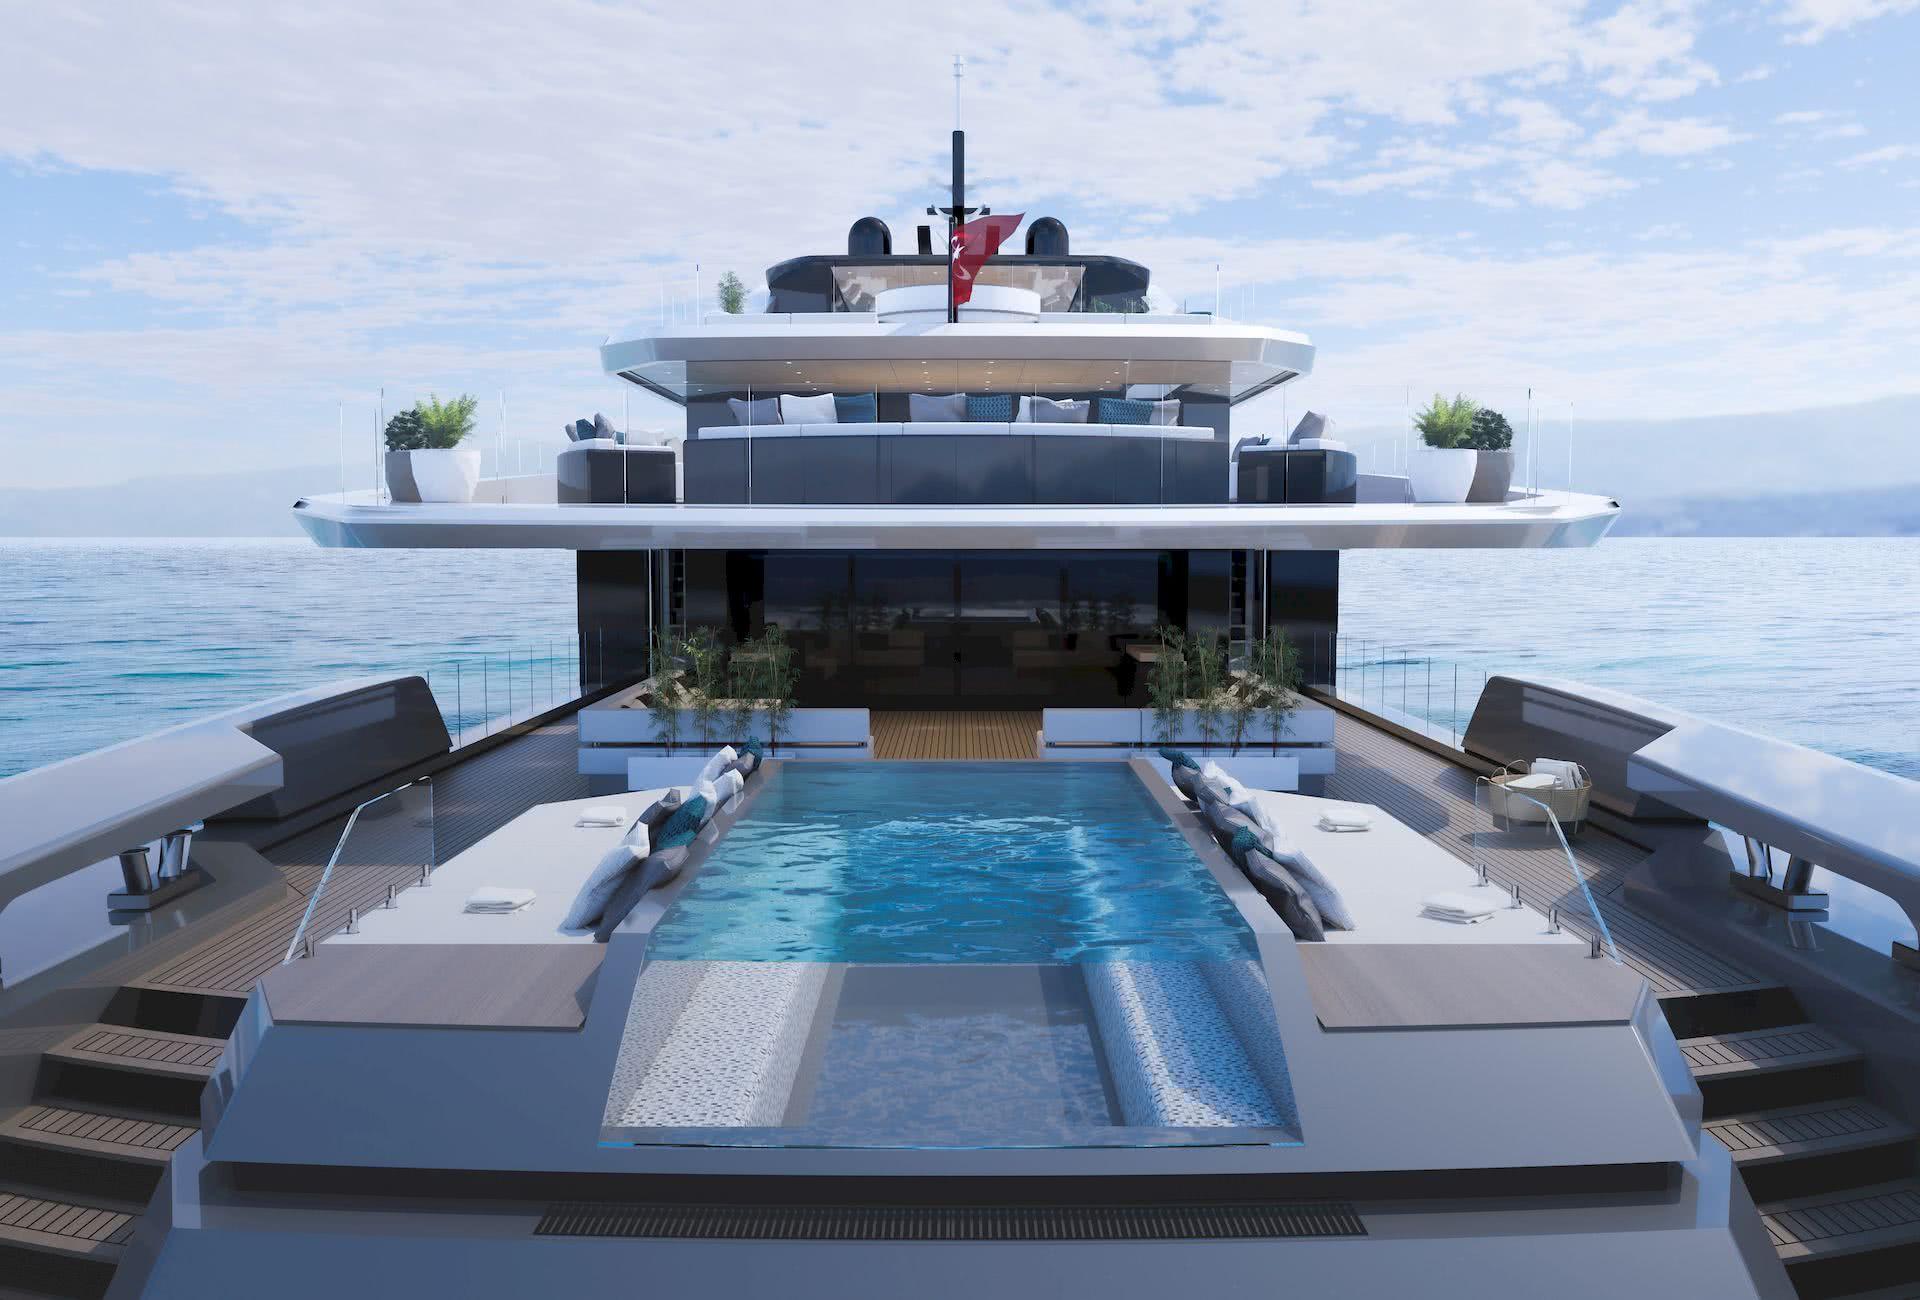 RMK 65 Hot Lab Yacht Design